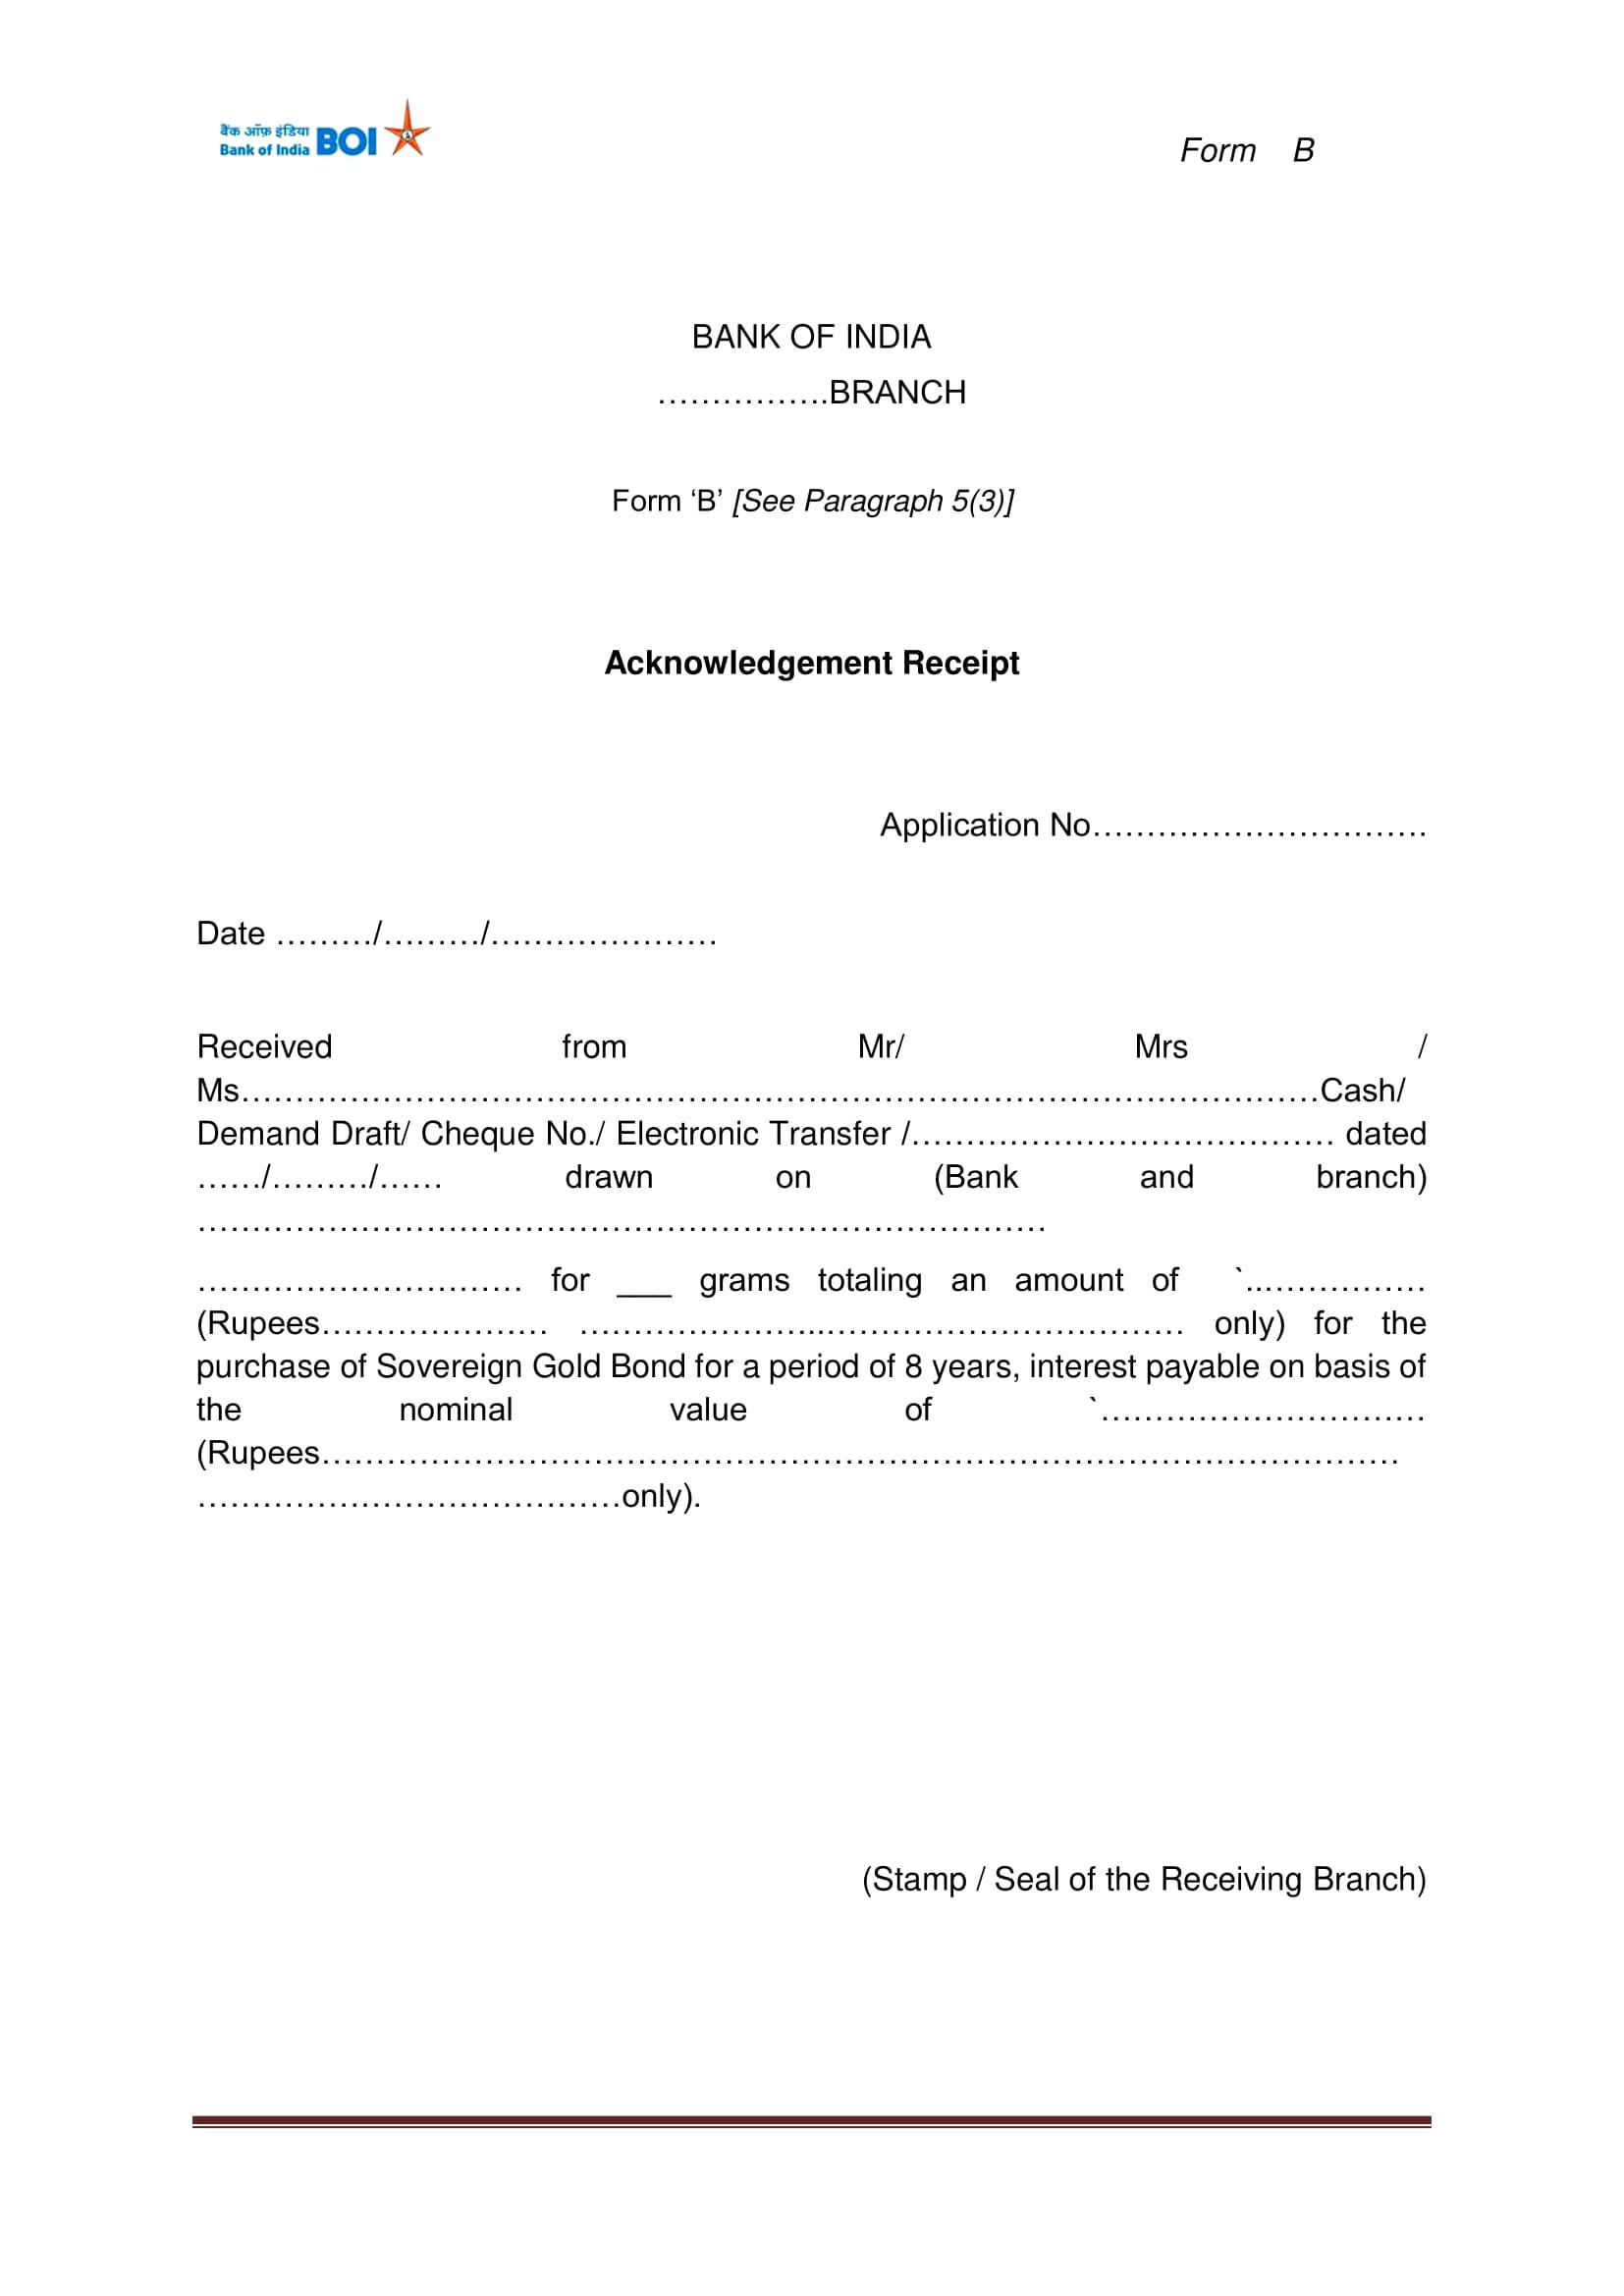 sample acknowledgment receipt